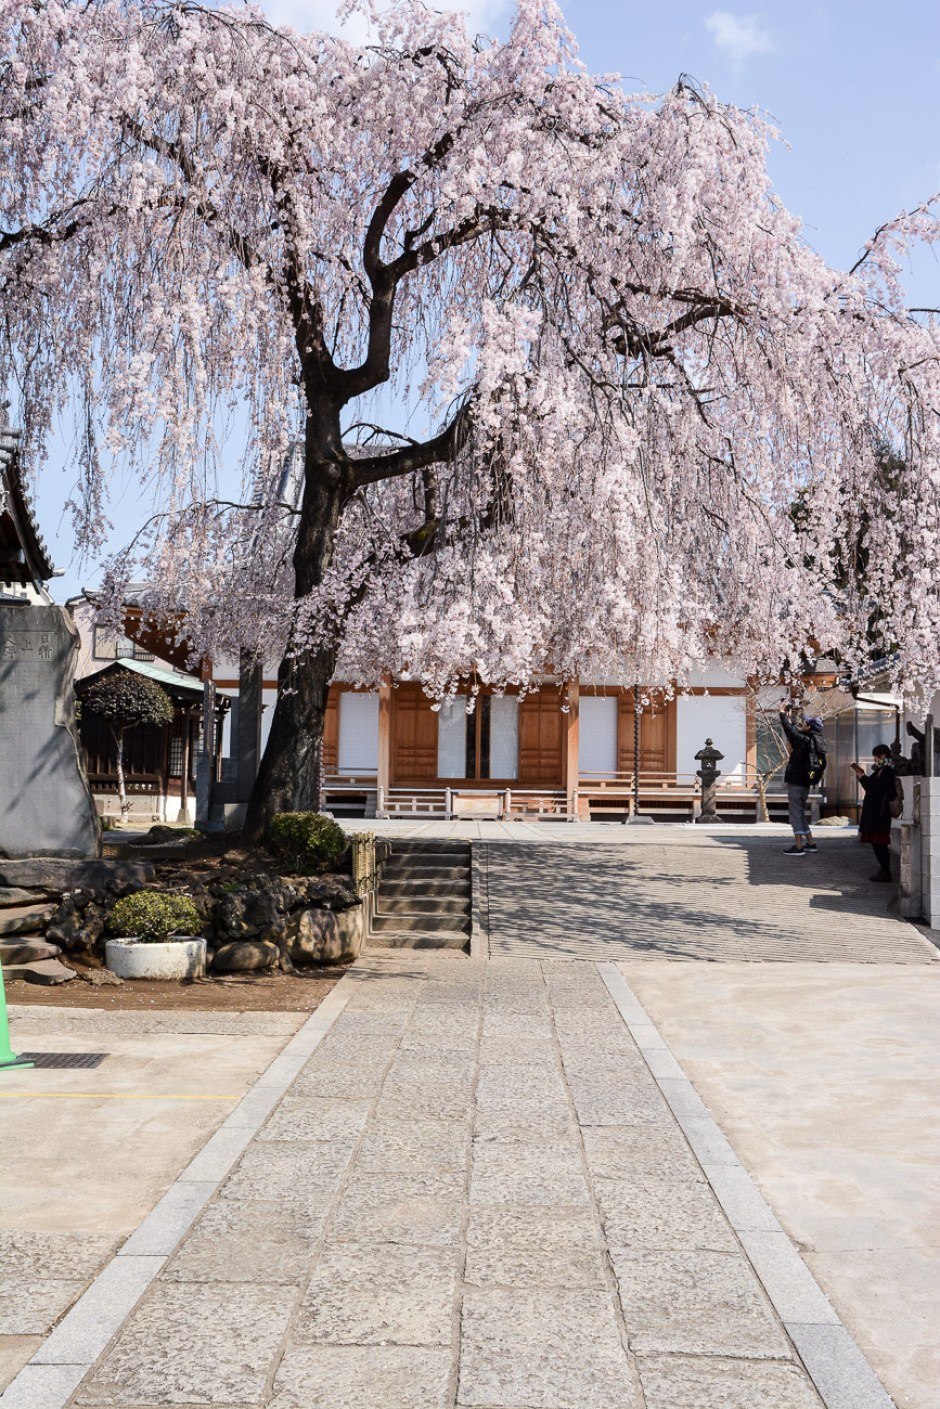 voyage tokyo hanami cerisiers fleurs